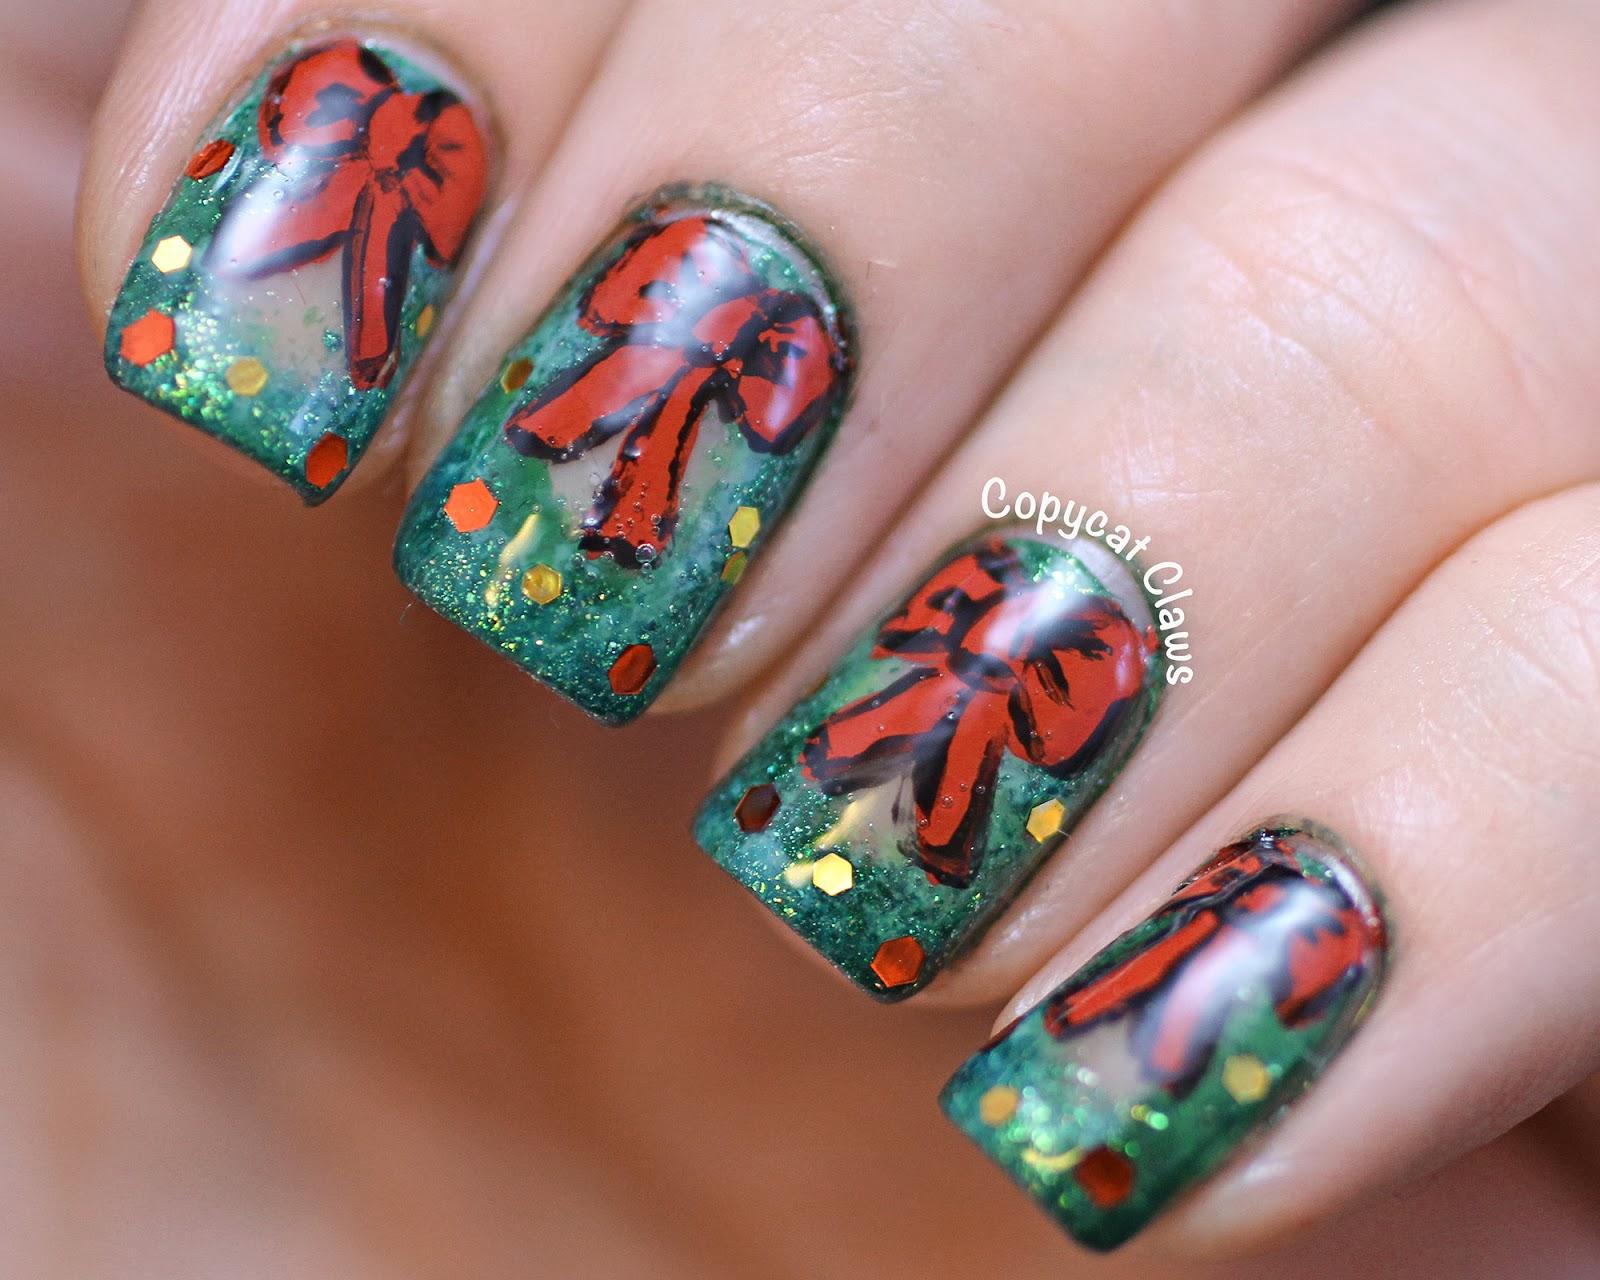 Copycat Claws Holiday Wreath Nail Art